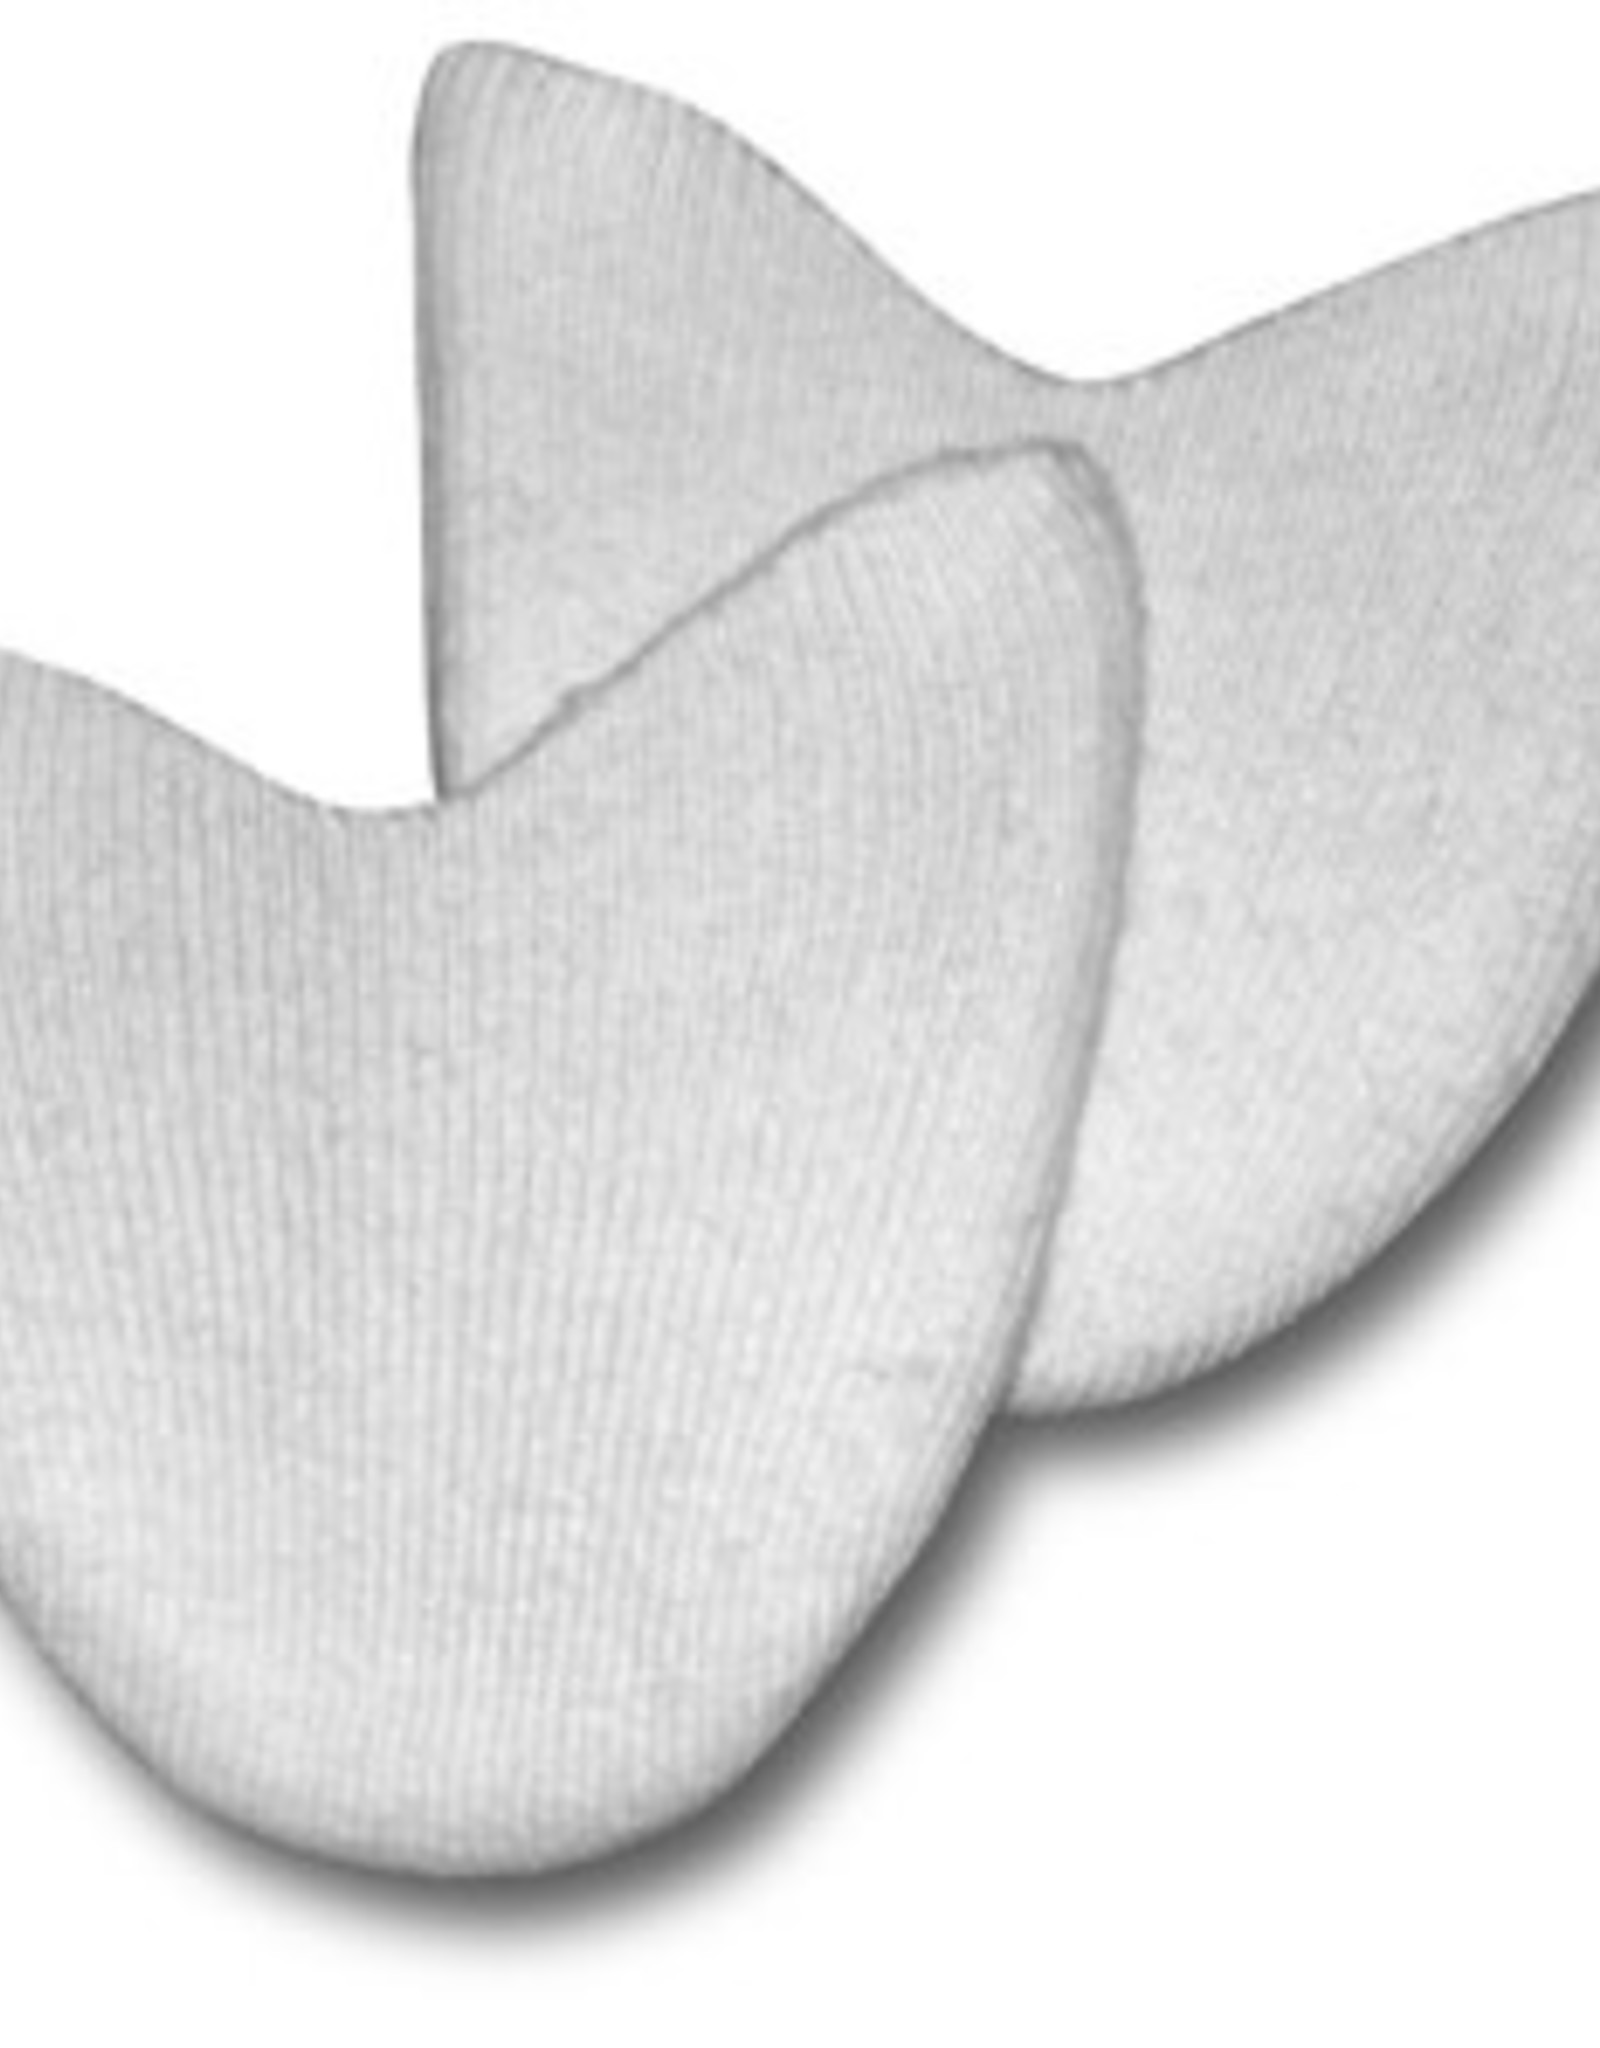 Pillows for Pointe PFP Super Gellows